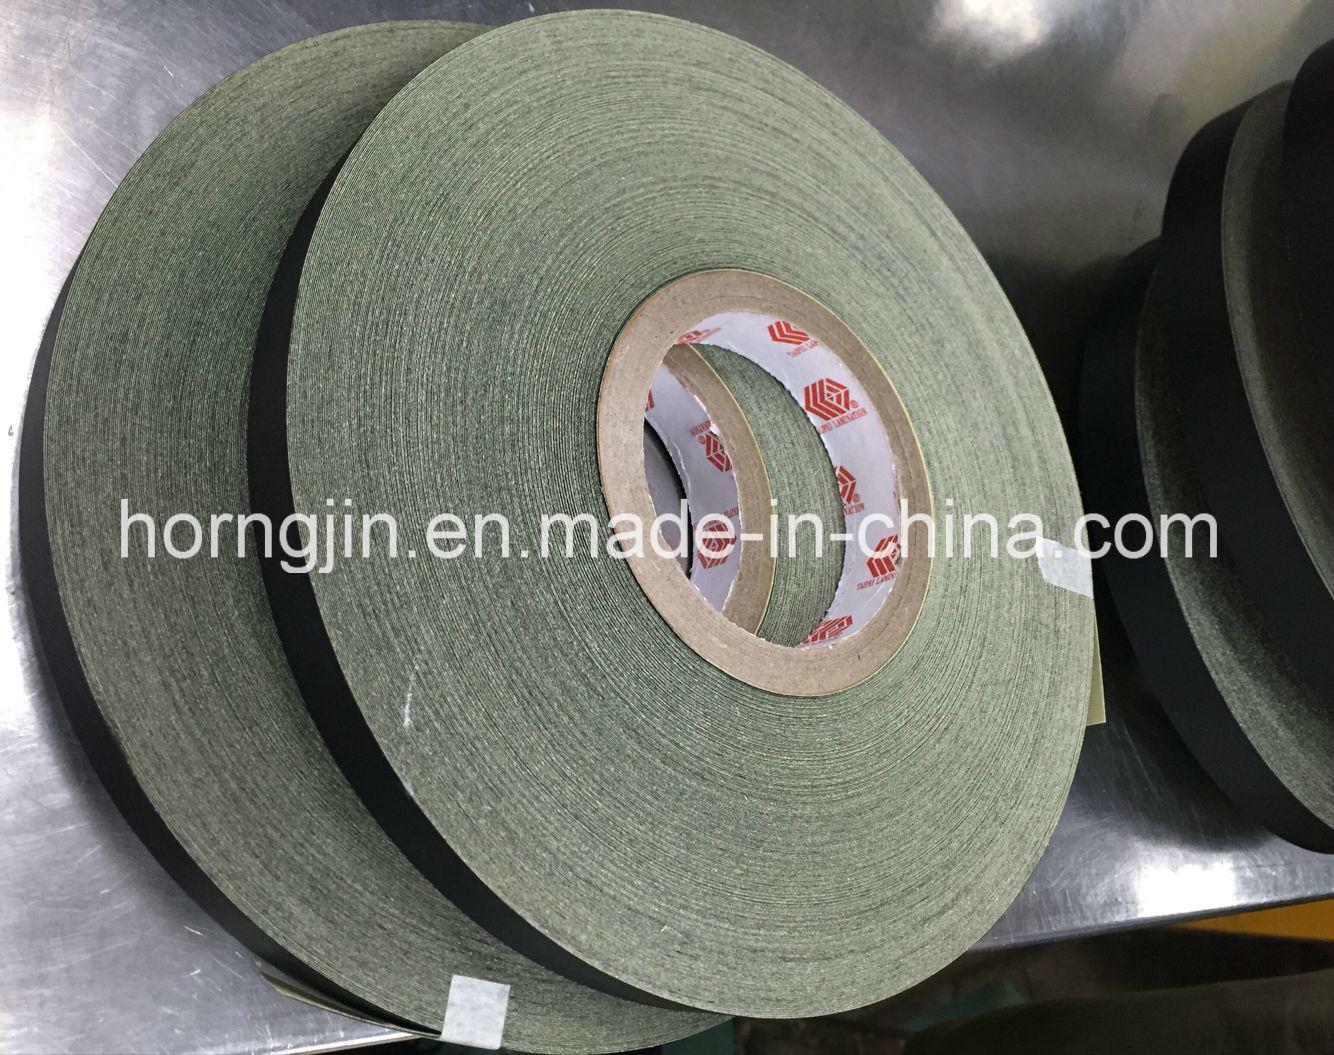 China Black Flame Retardant Acetate Cloth Tape With Acrylic Wiring Insulation